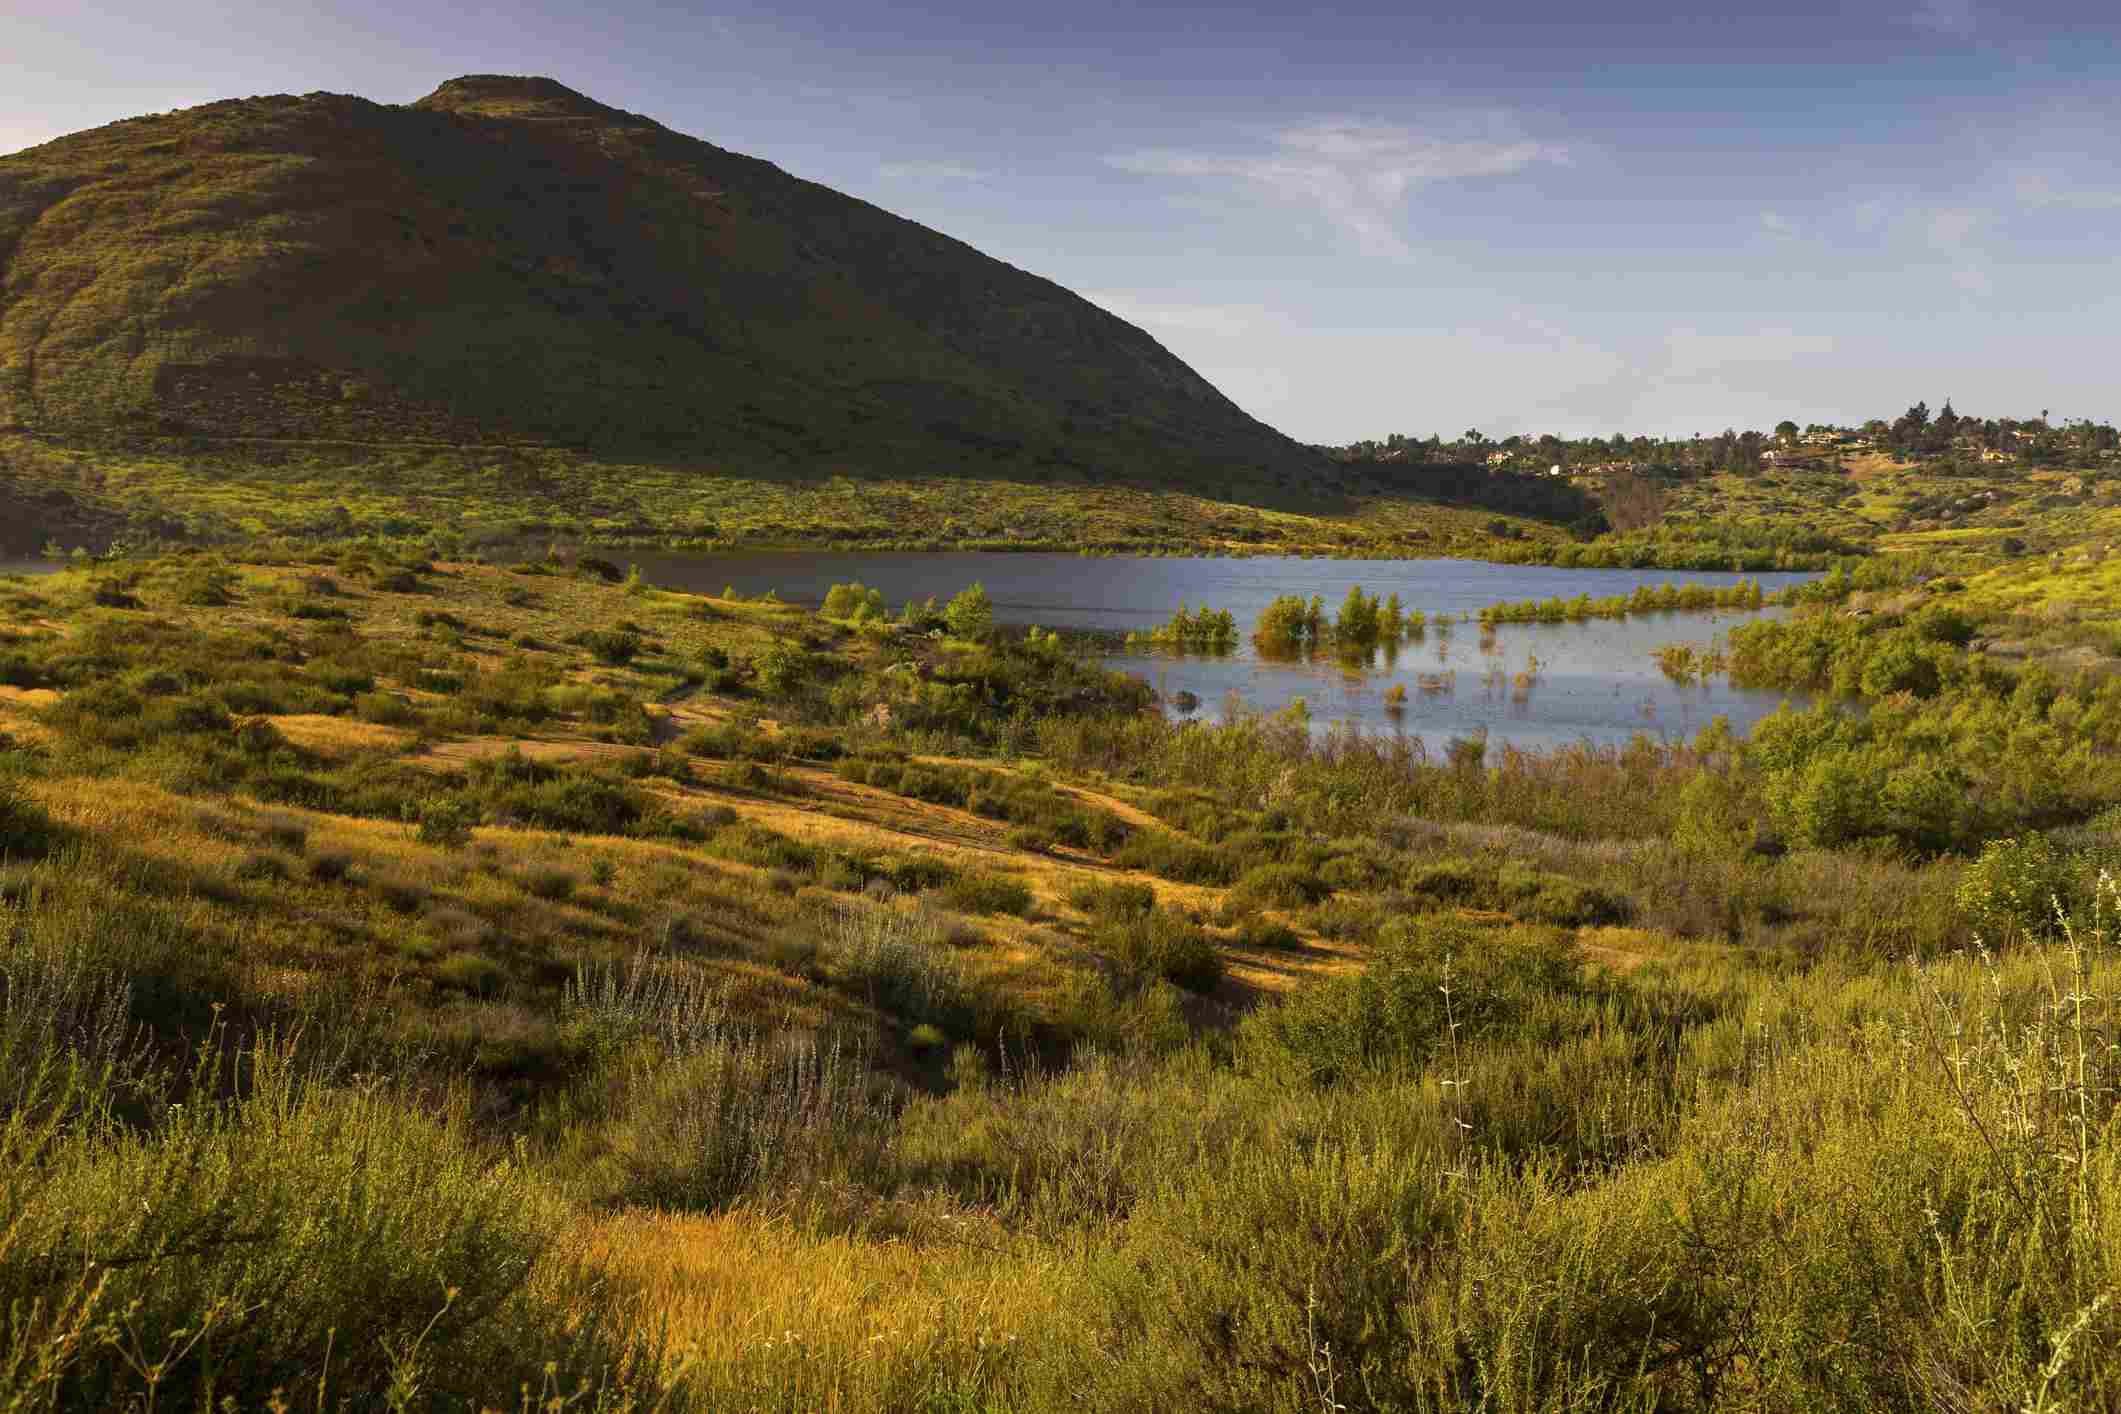 Lake Hodges, south of Escondido